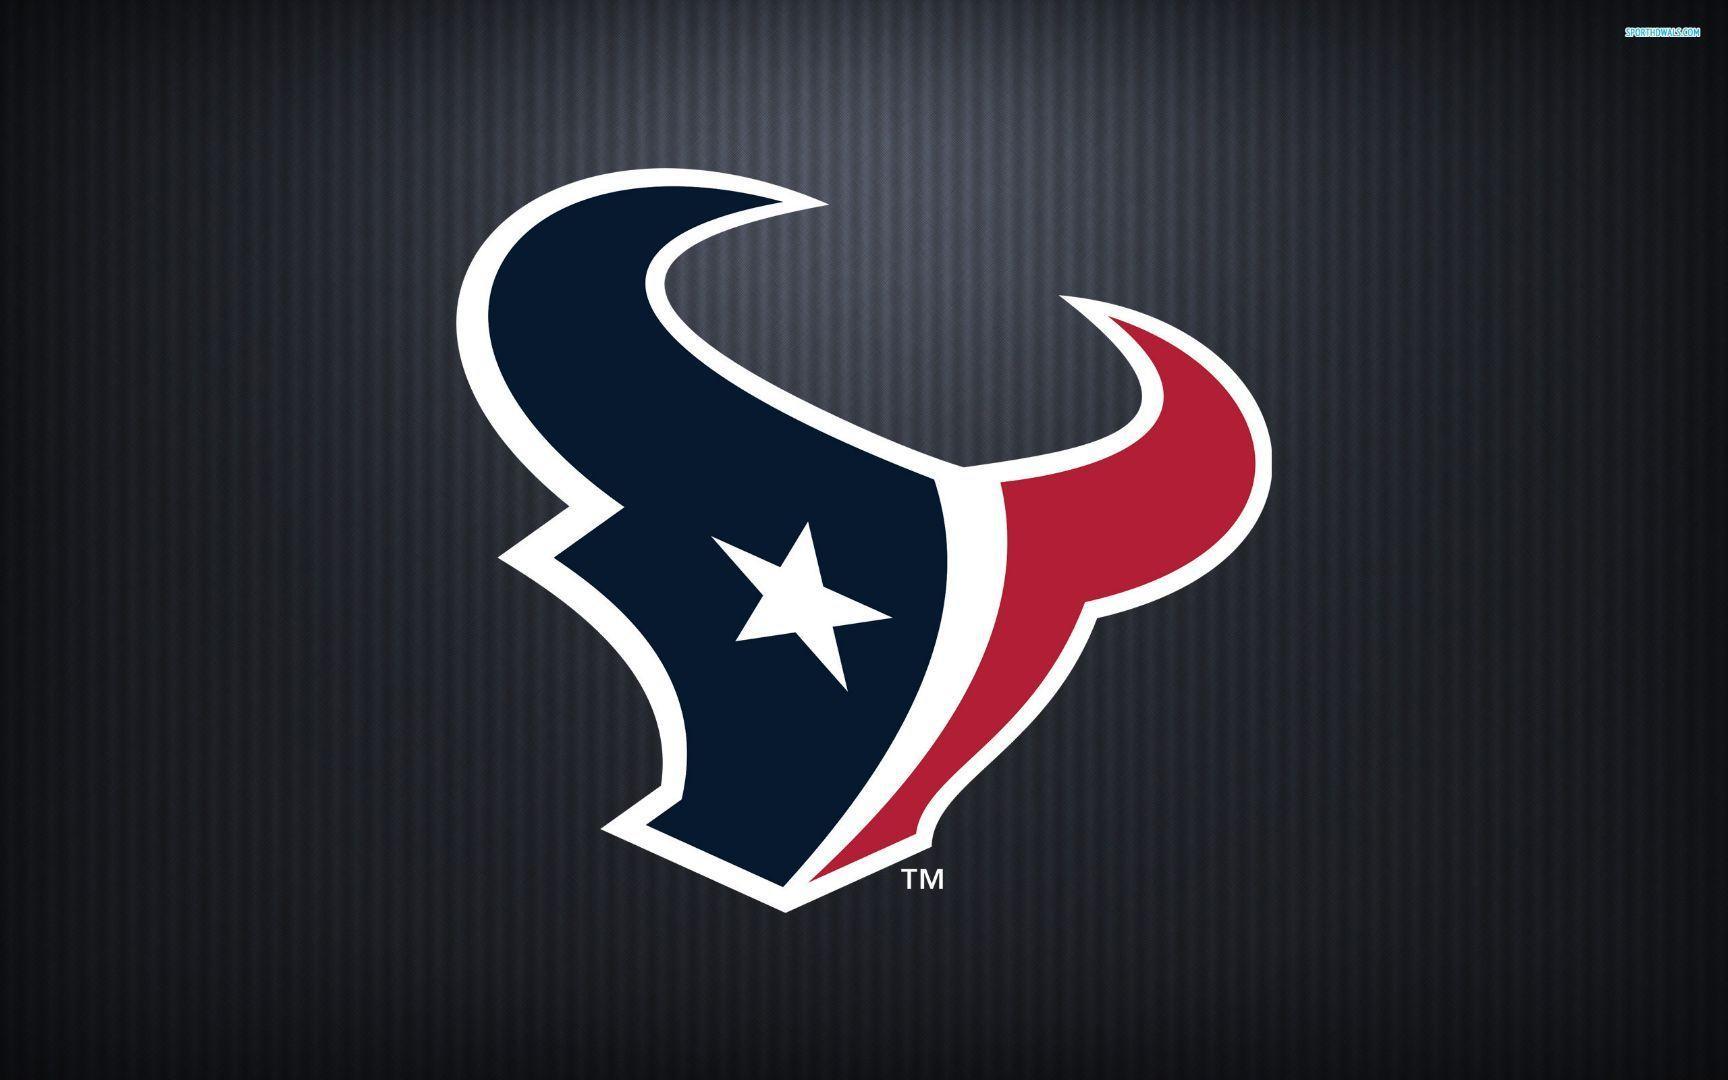 Houston Texans Wallpapers 2015 1728x1080